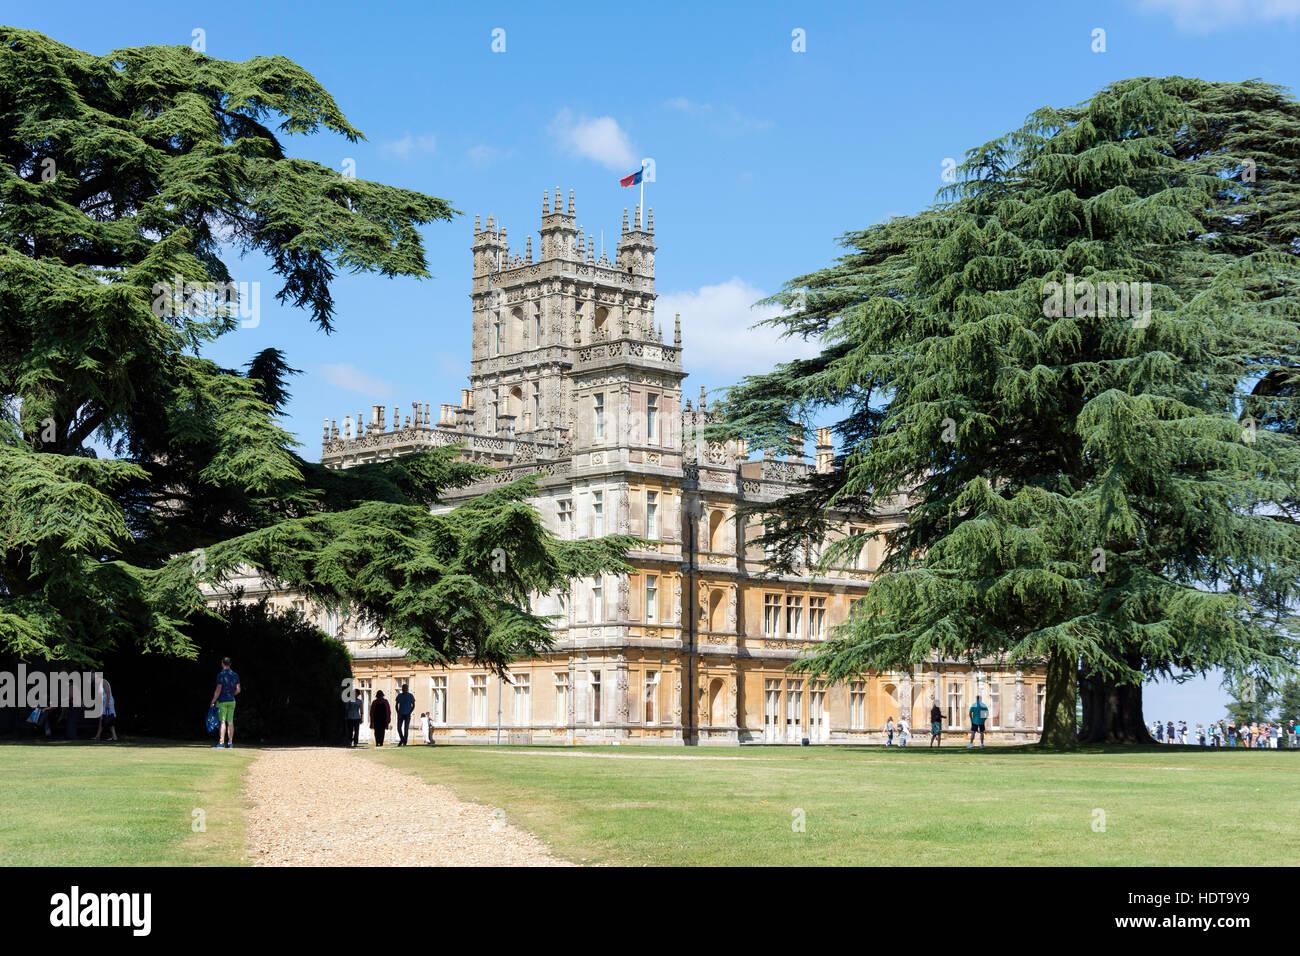 Highclere Castle (Downton Abbey TV series), Highclere, Hampshire, England, United Kingdom - Stock Image